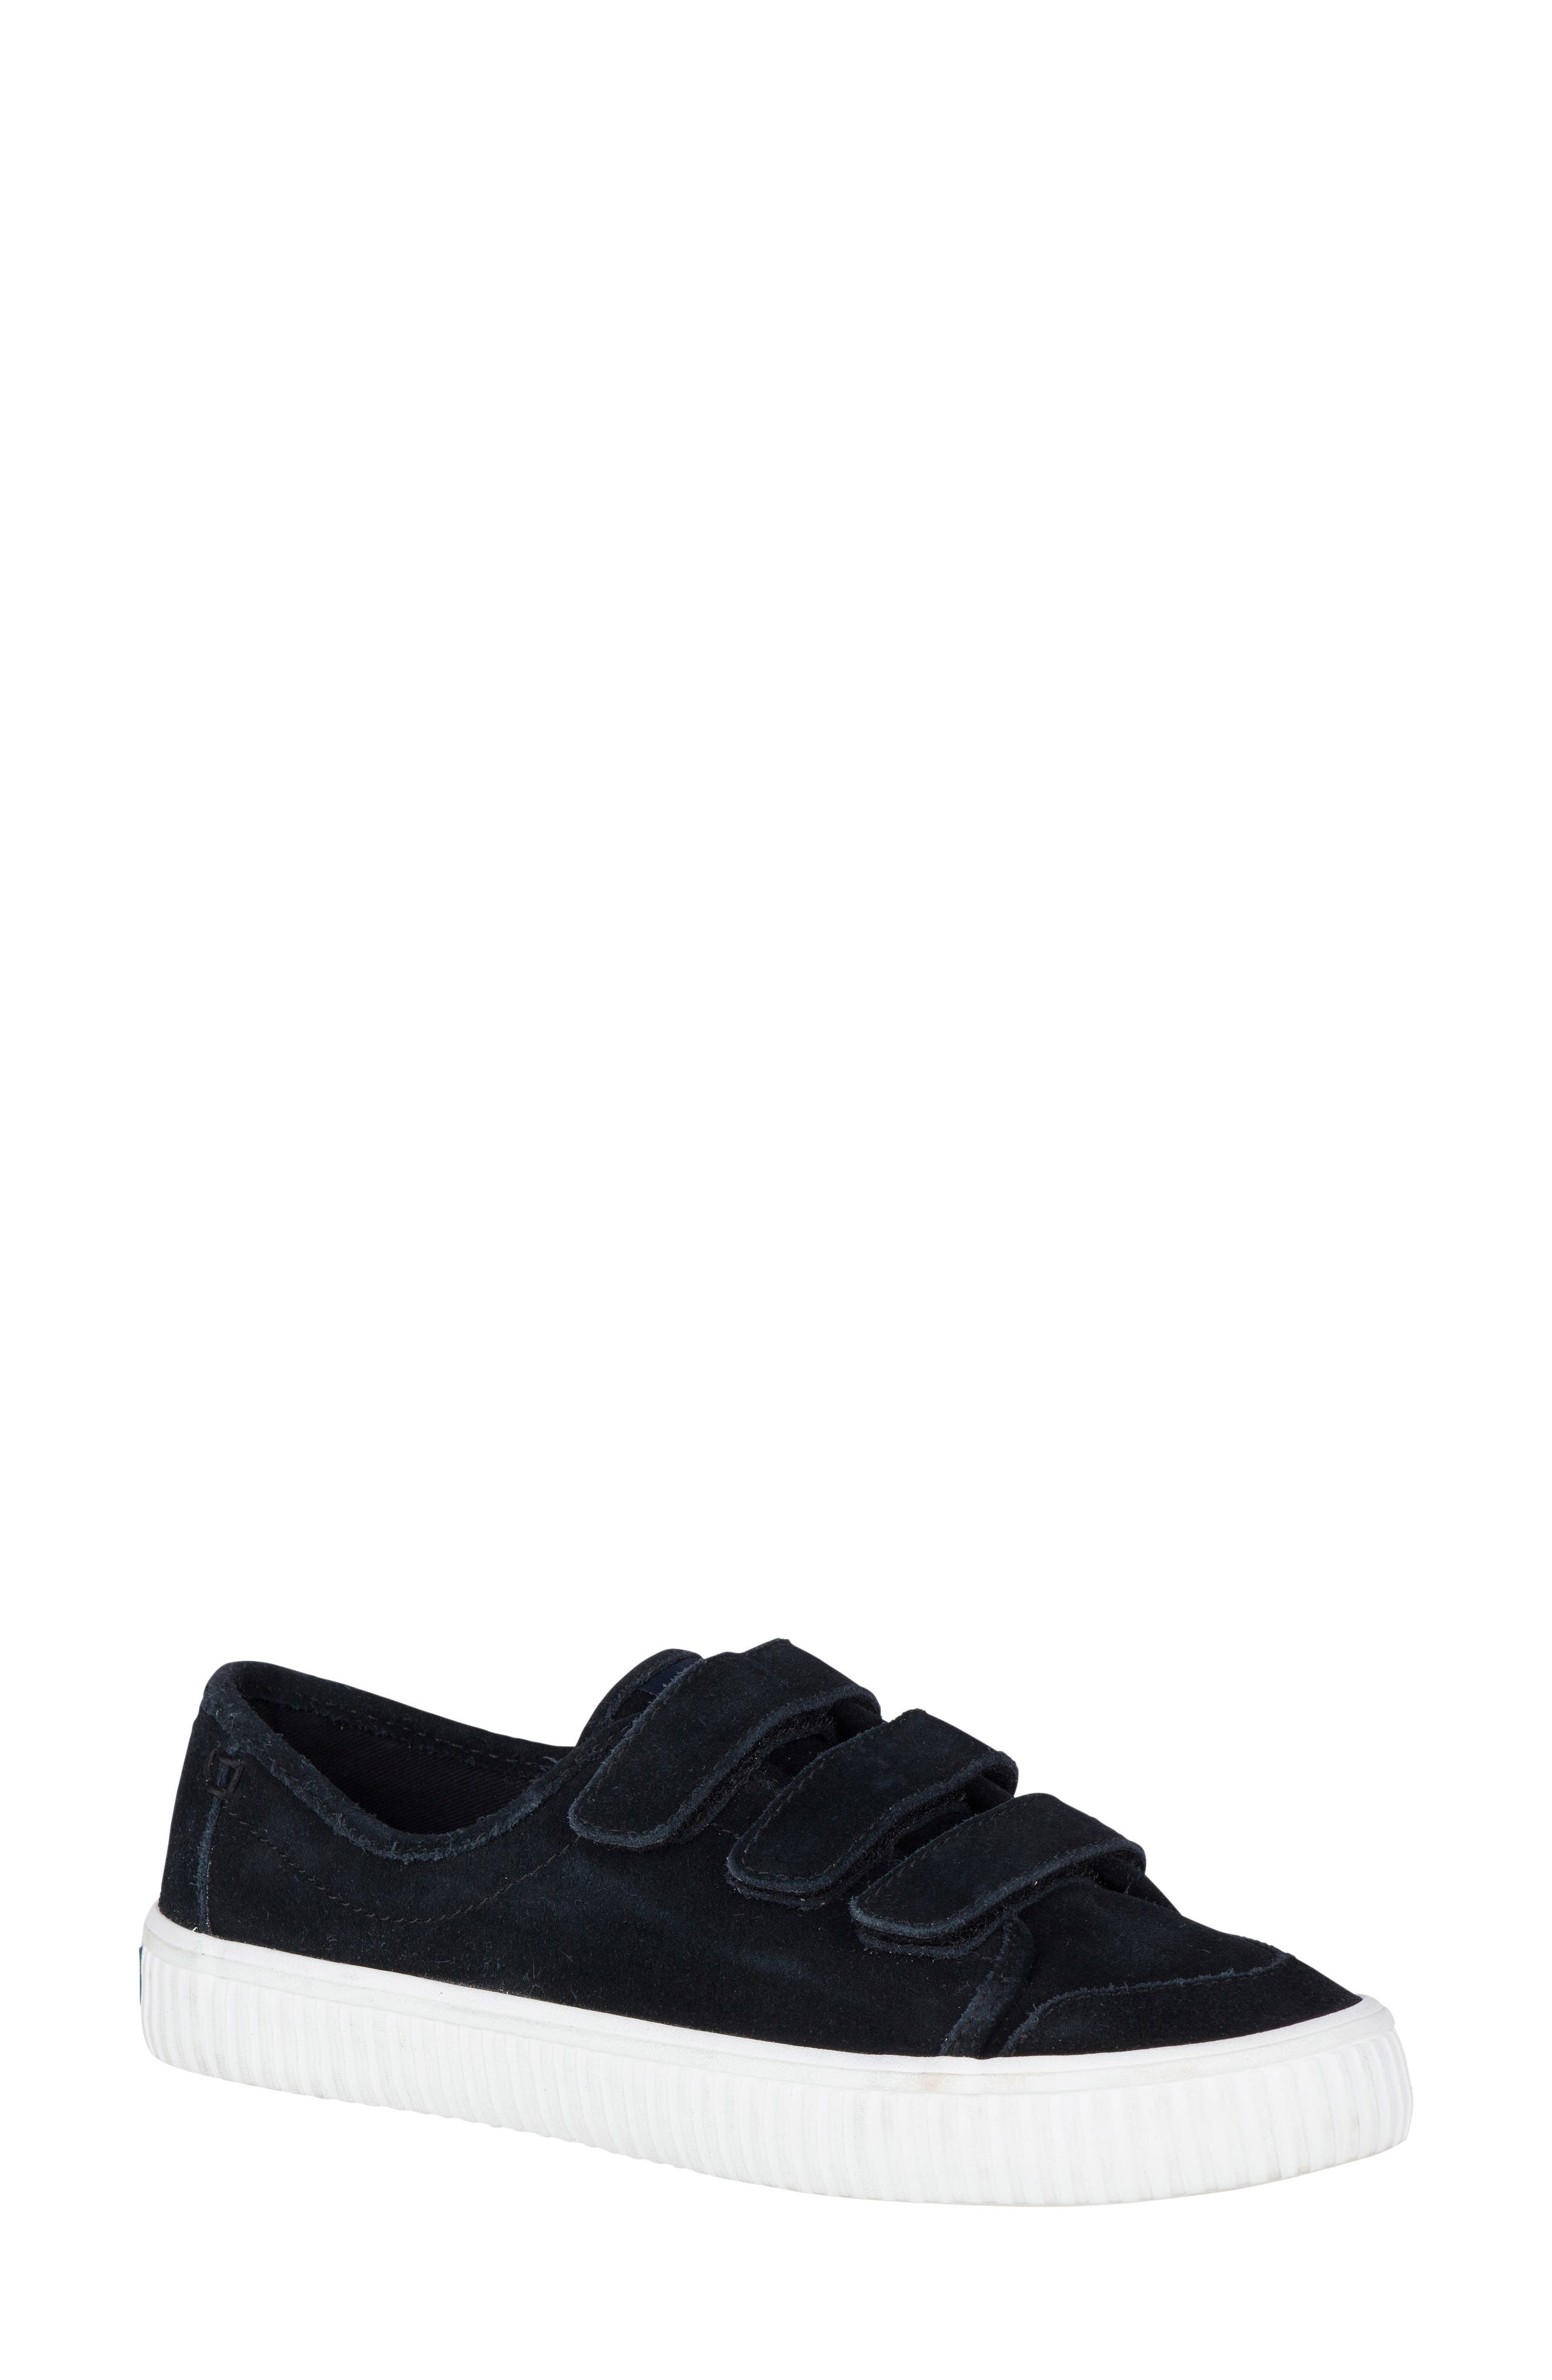 Creeper Sneaker,                             Main thumbnail 1, color,                             001